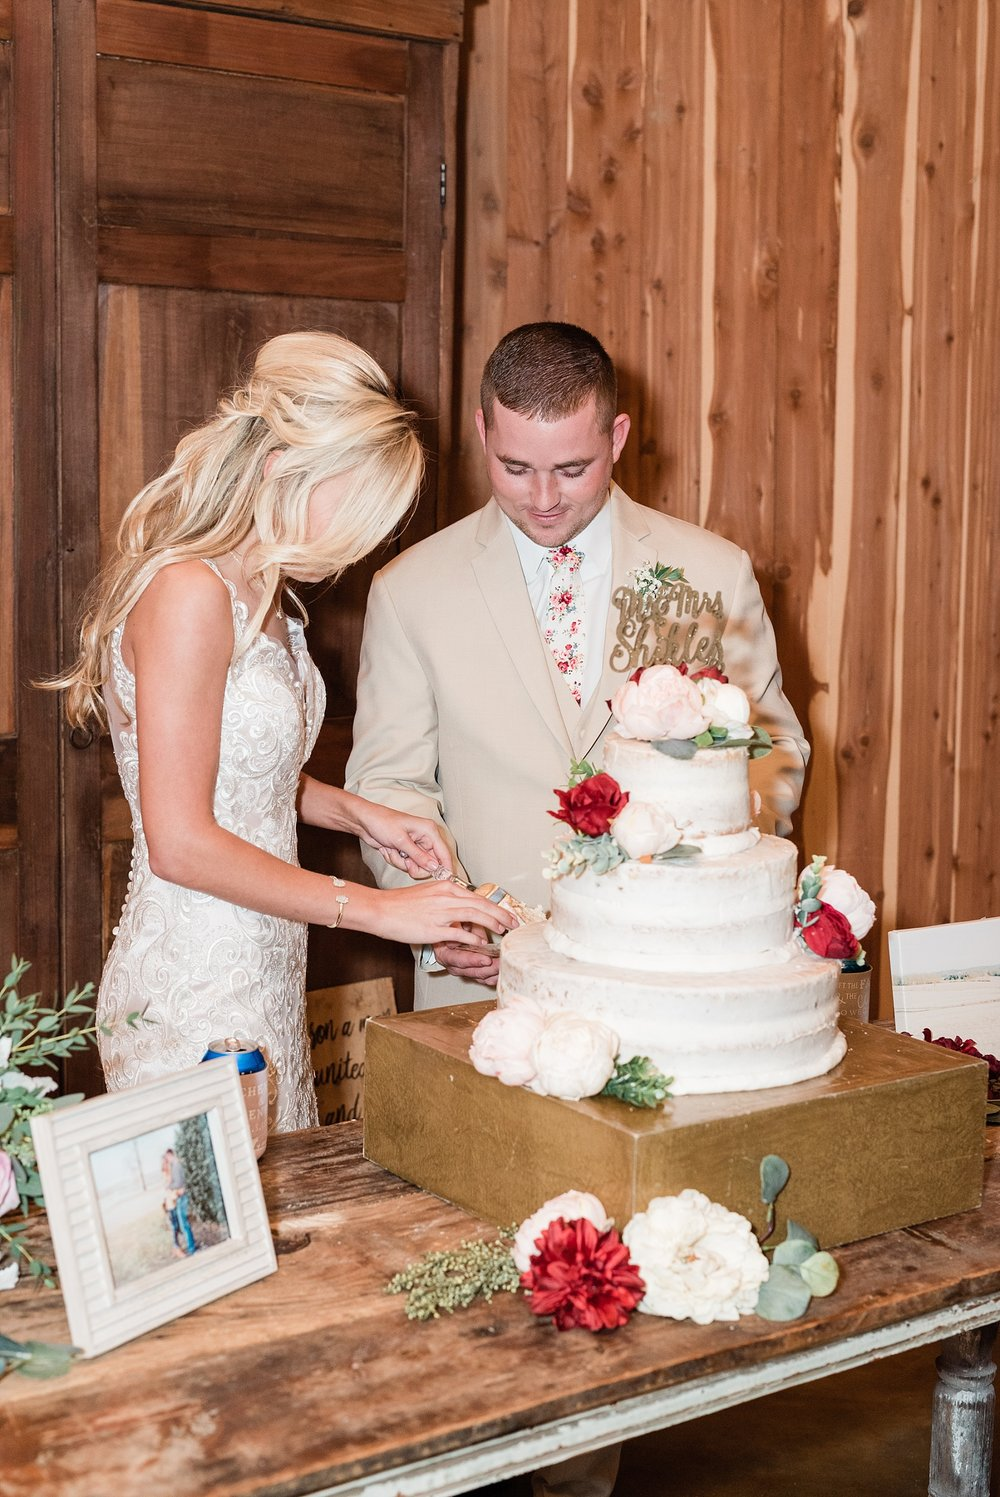 Lakeside Wedding in Fall at Mighty Oak Lodge by Misouri Wedding Photographer Kelsi Kliethermes Photography_0045.jpg